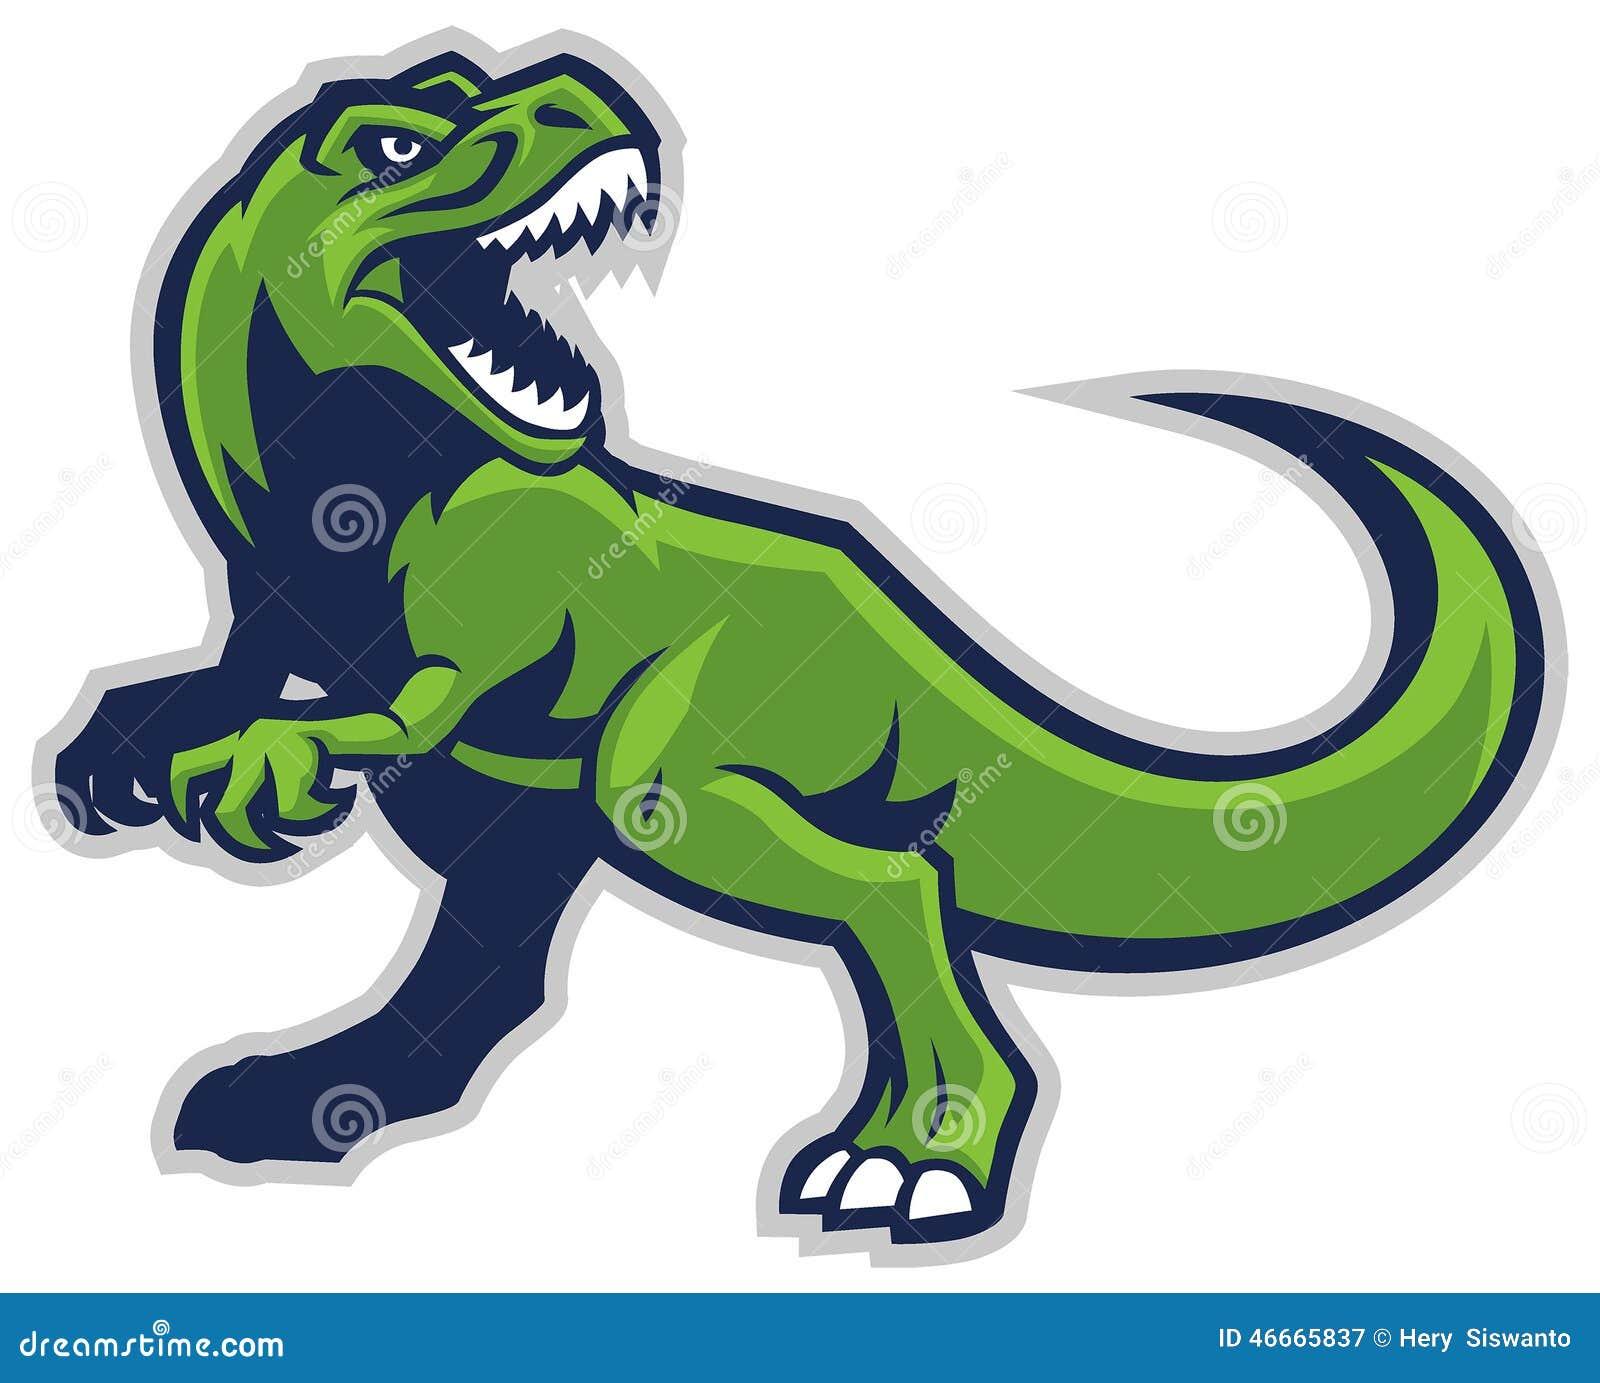 Trex Mascot Stock Vector - Image: 46665837